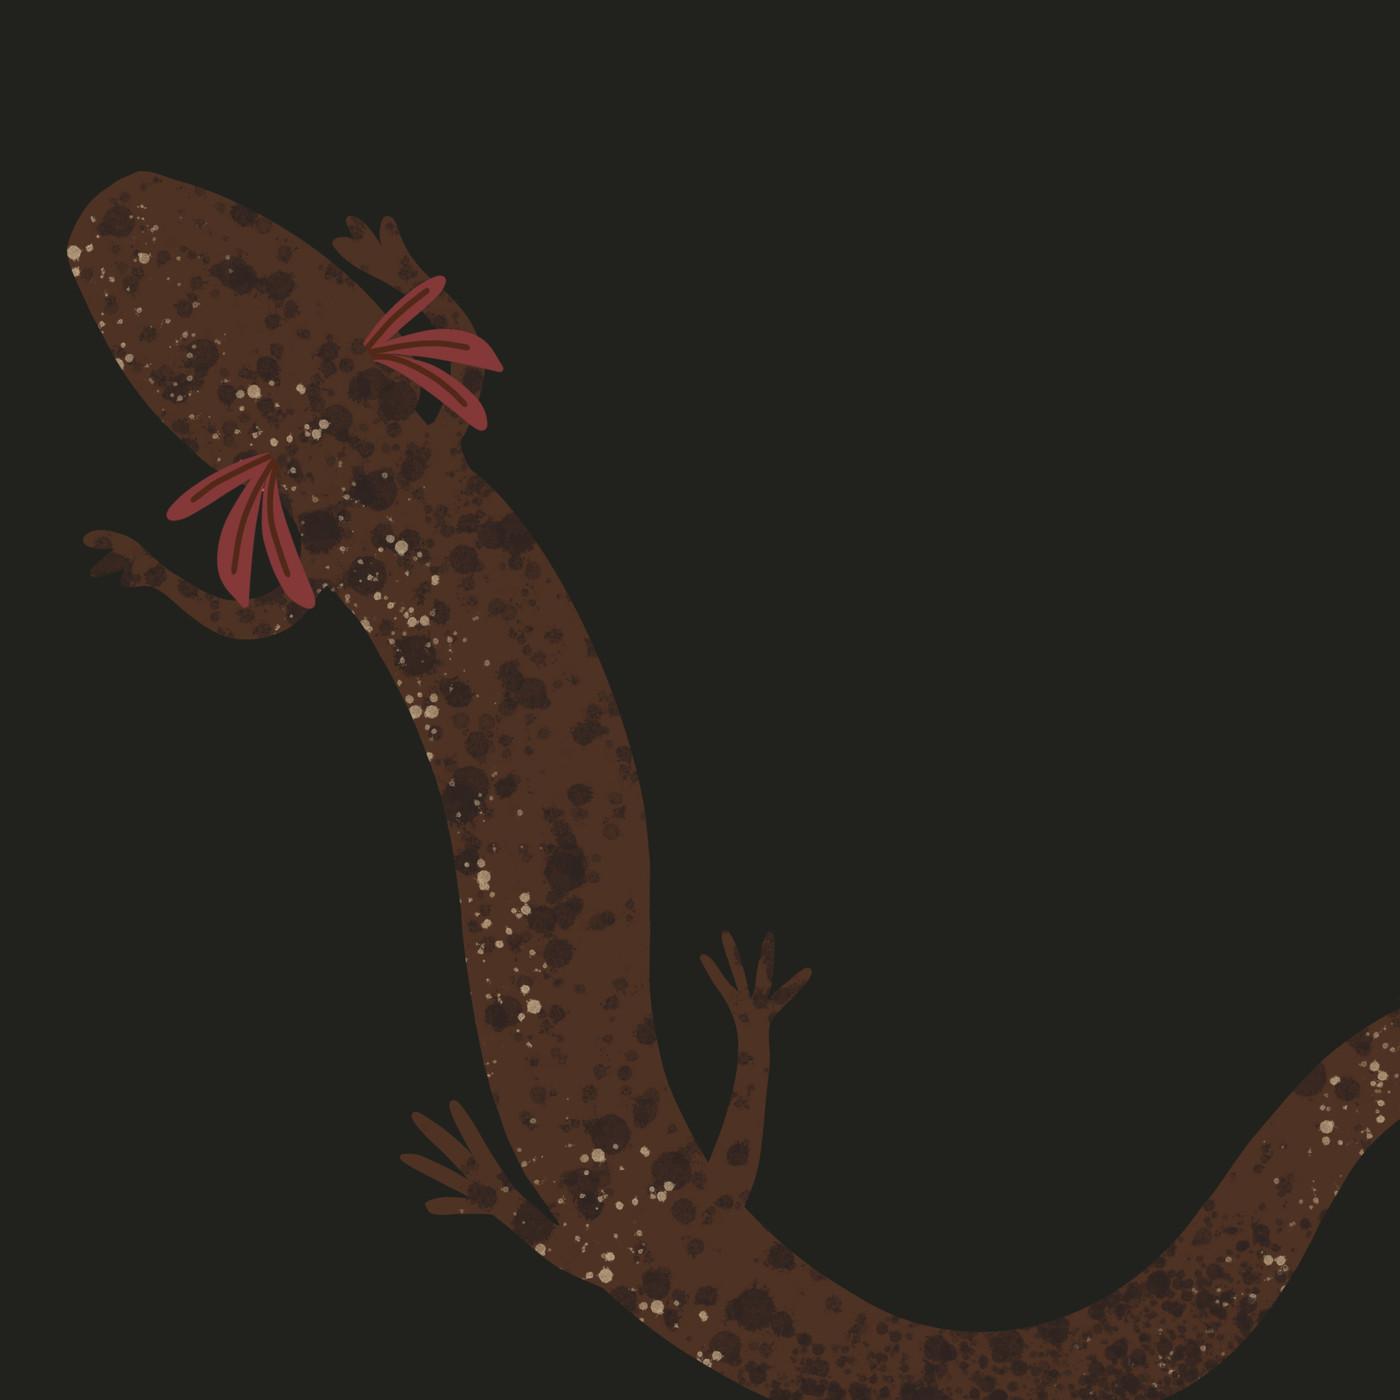 Jollyville Plateau Salamander (Eurycea tonkawae)